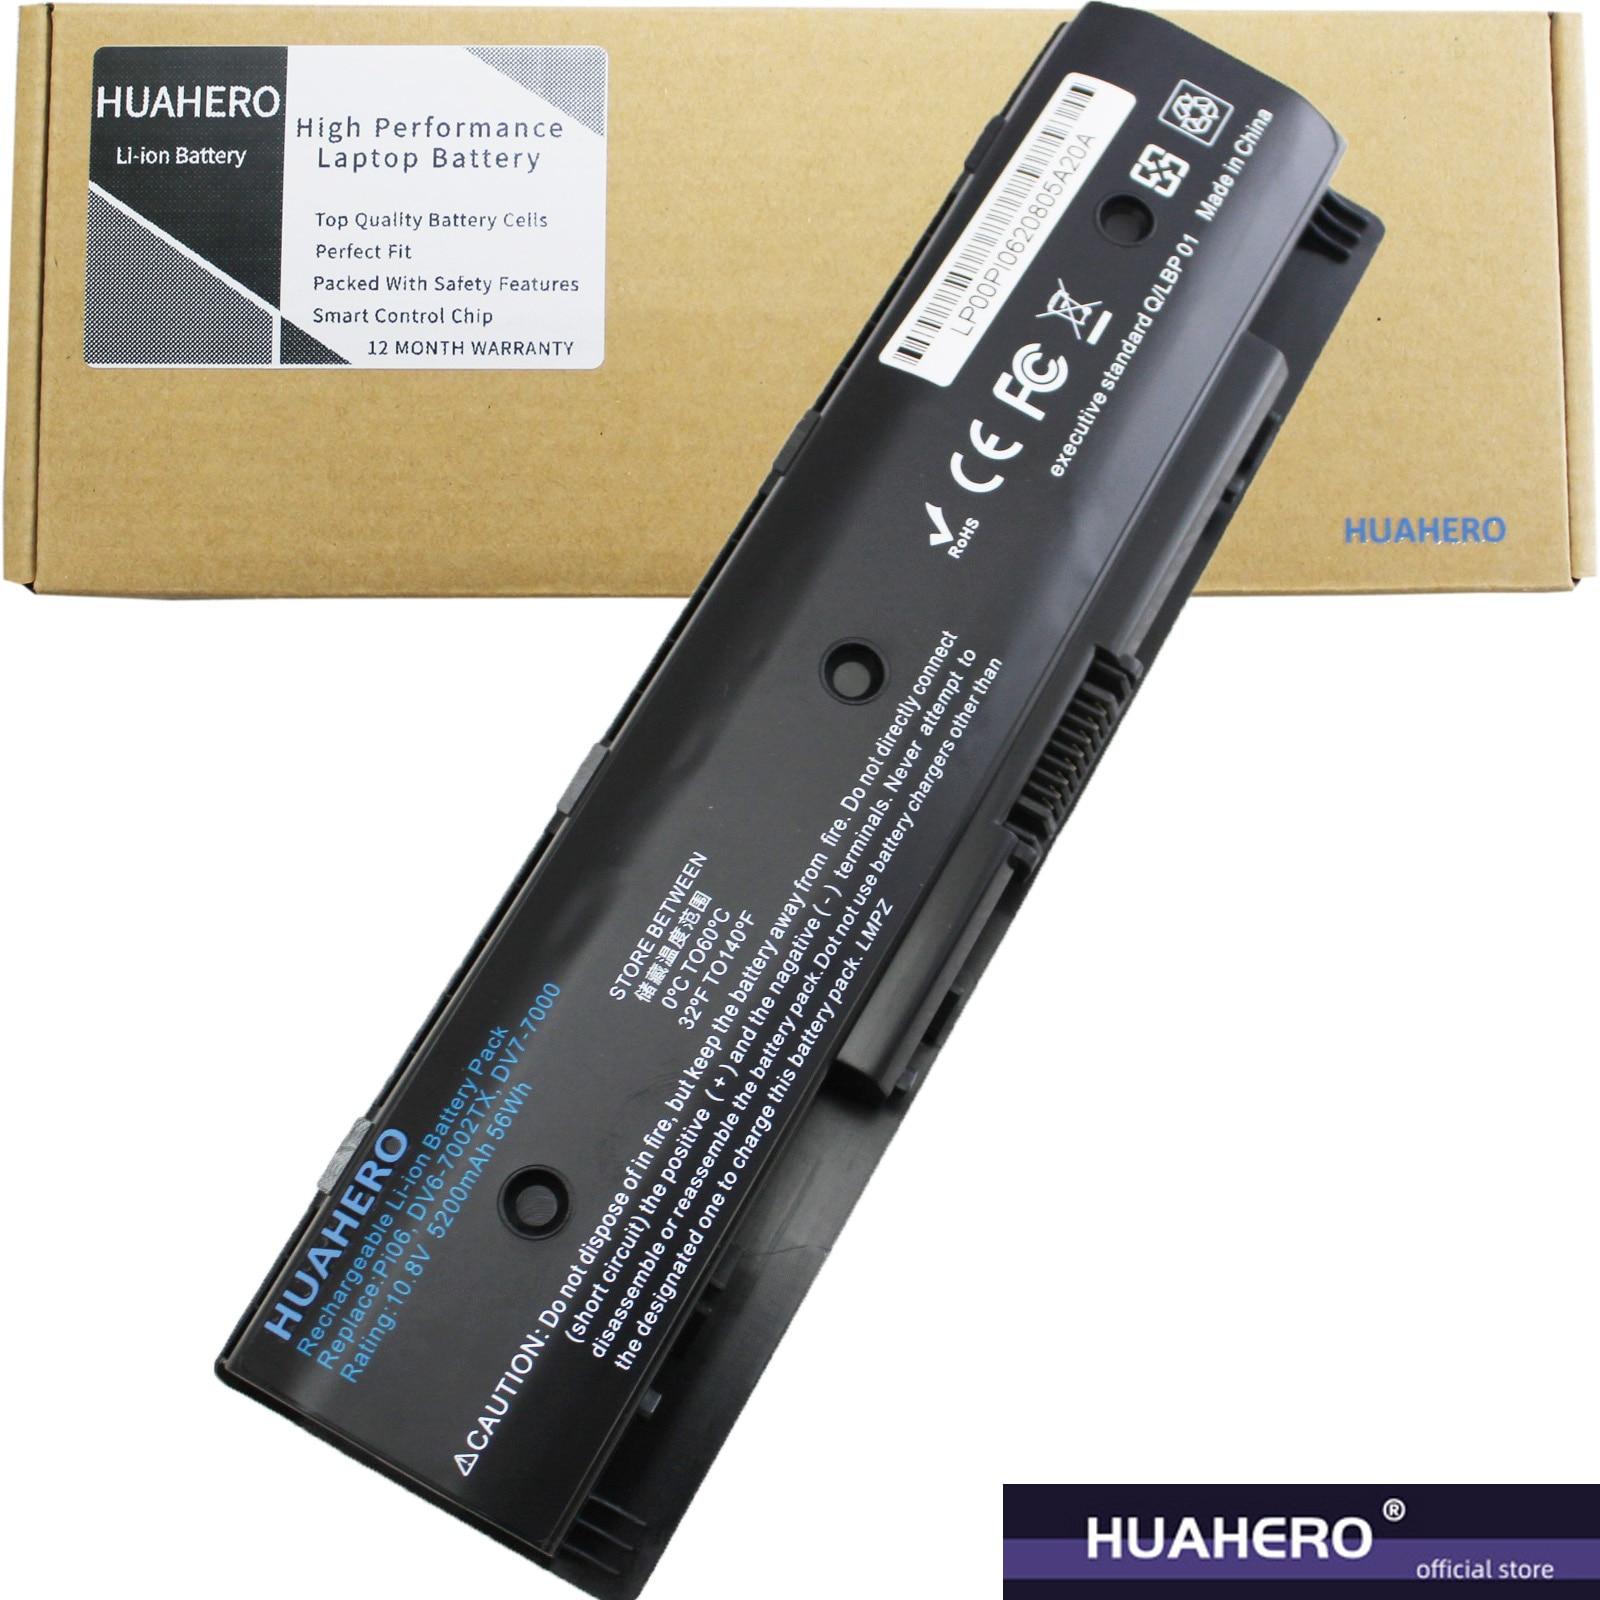 HUAHERO PI06 بطارية ل HP الحسد 15 17 17z جناح 14 14z 14t hstnn yb40 710416 001 710417 001 P106 الكمبيوتر الدفتري توش PI09